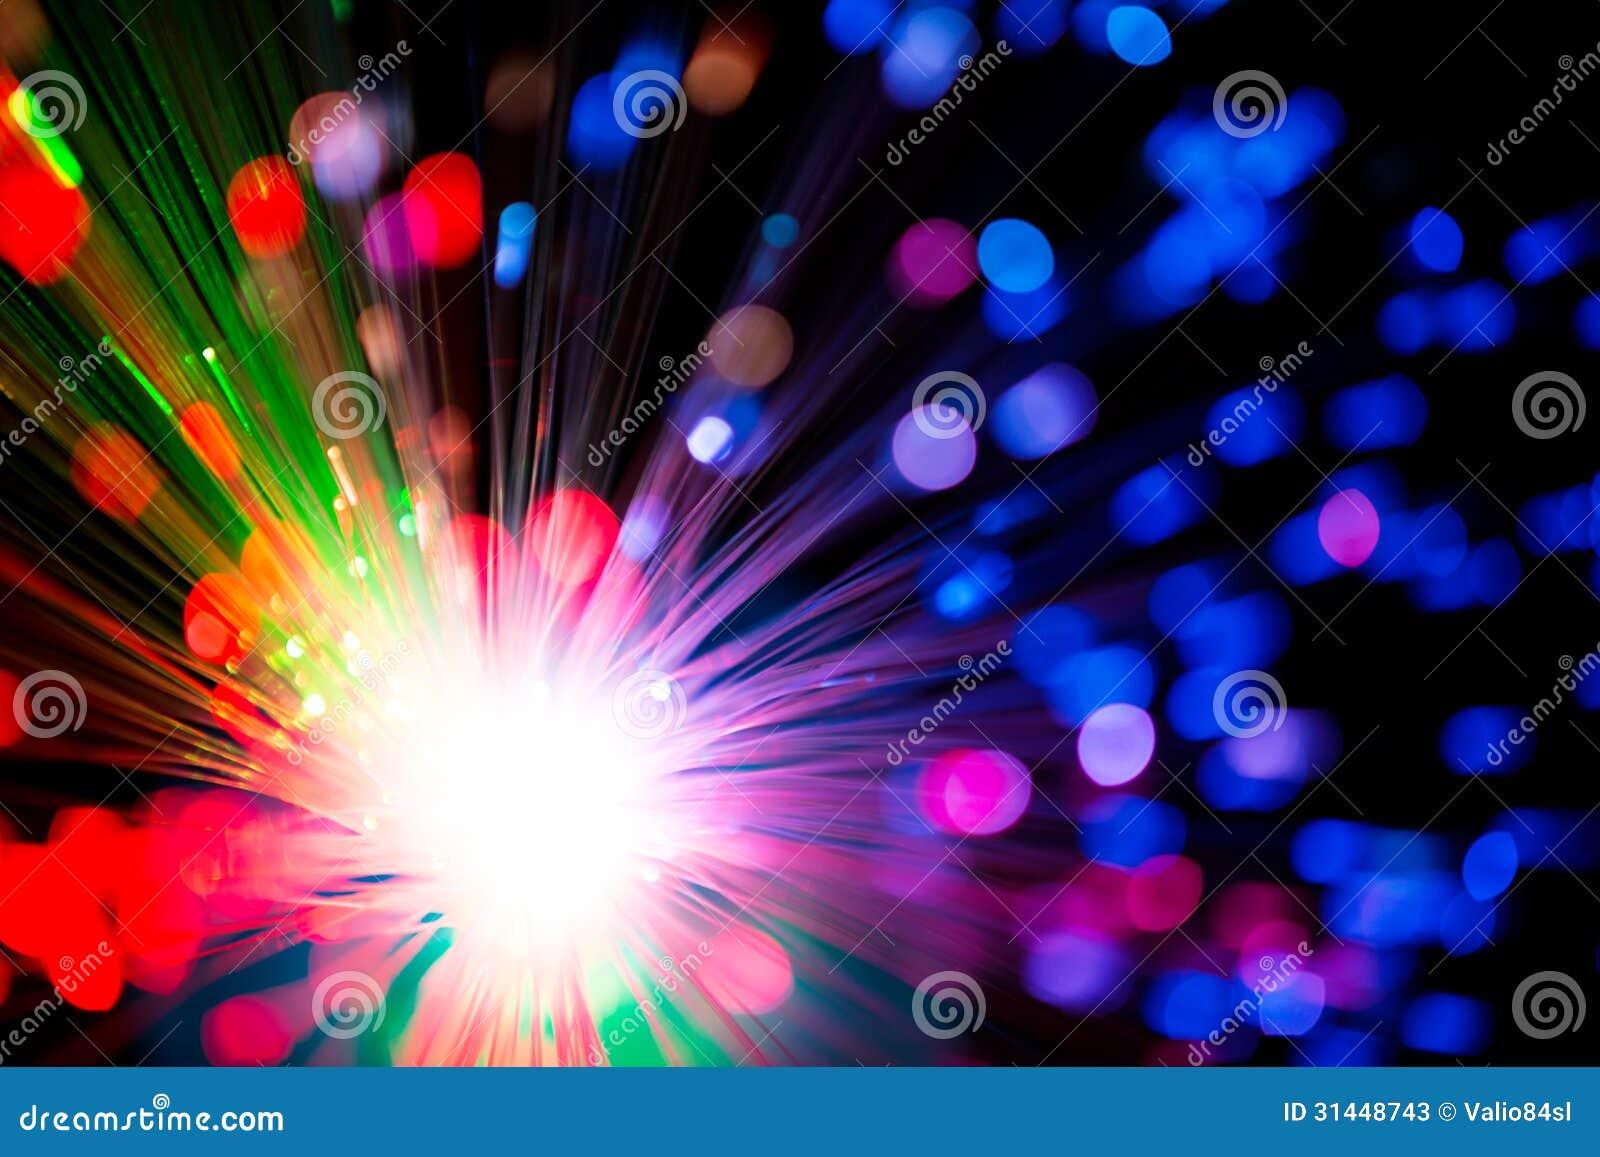 201 clairage de fibre optique multicolore photos stock image 31448743